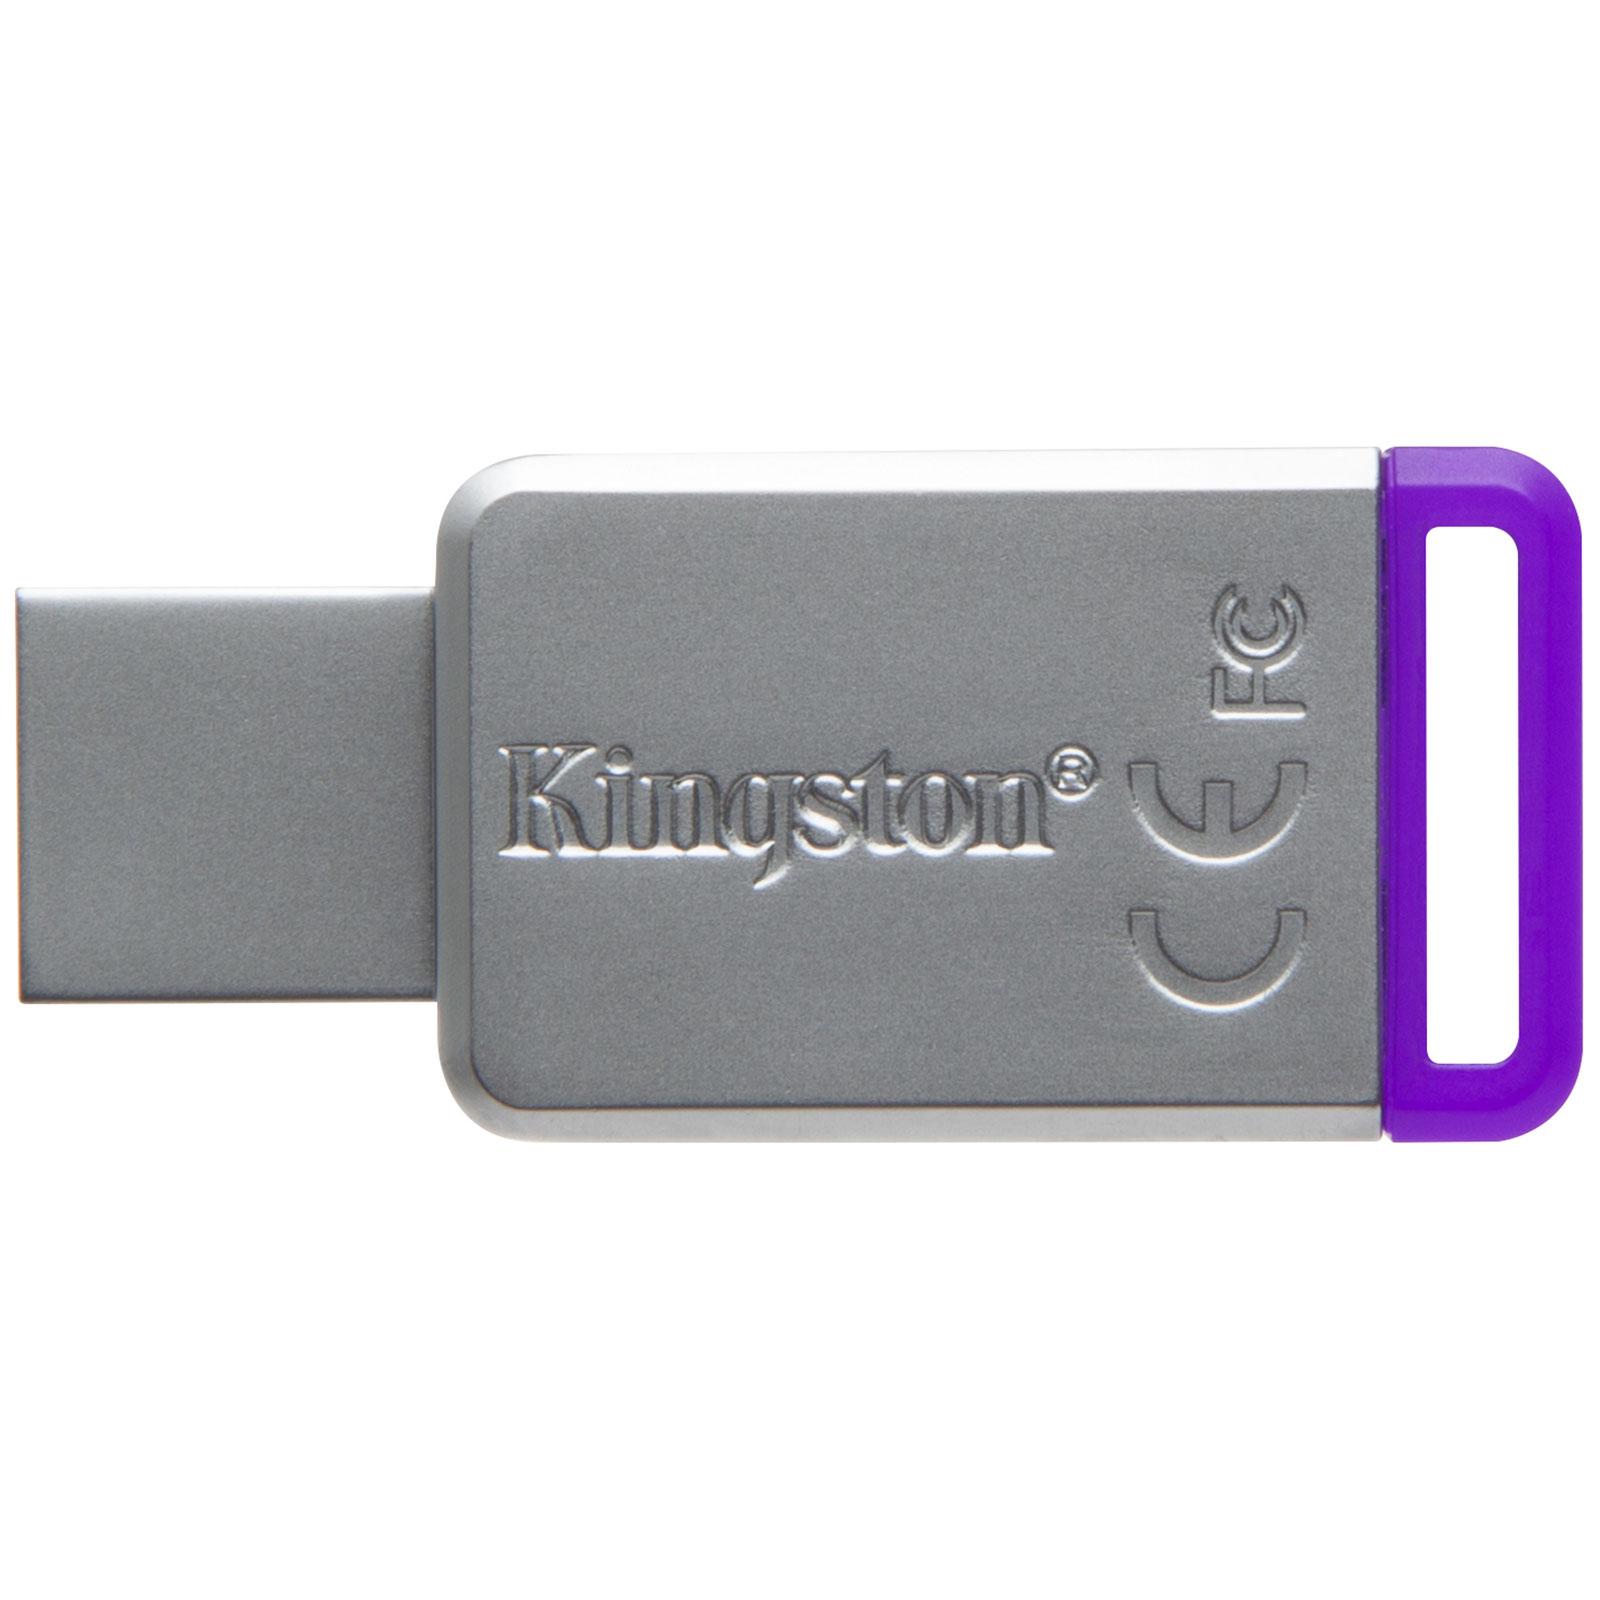 Kingston DataTraveler 50 8Go USB 3.1 (DT50/8GB) - Achat / Vente Clé USB sur Cybertek.fr - 2